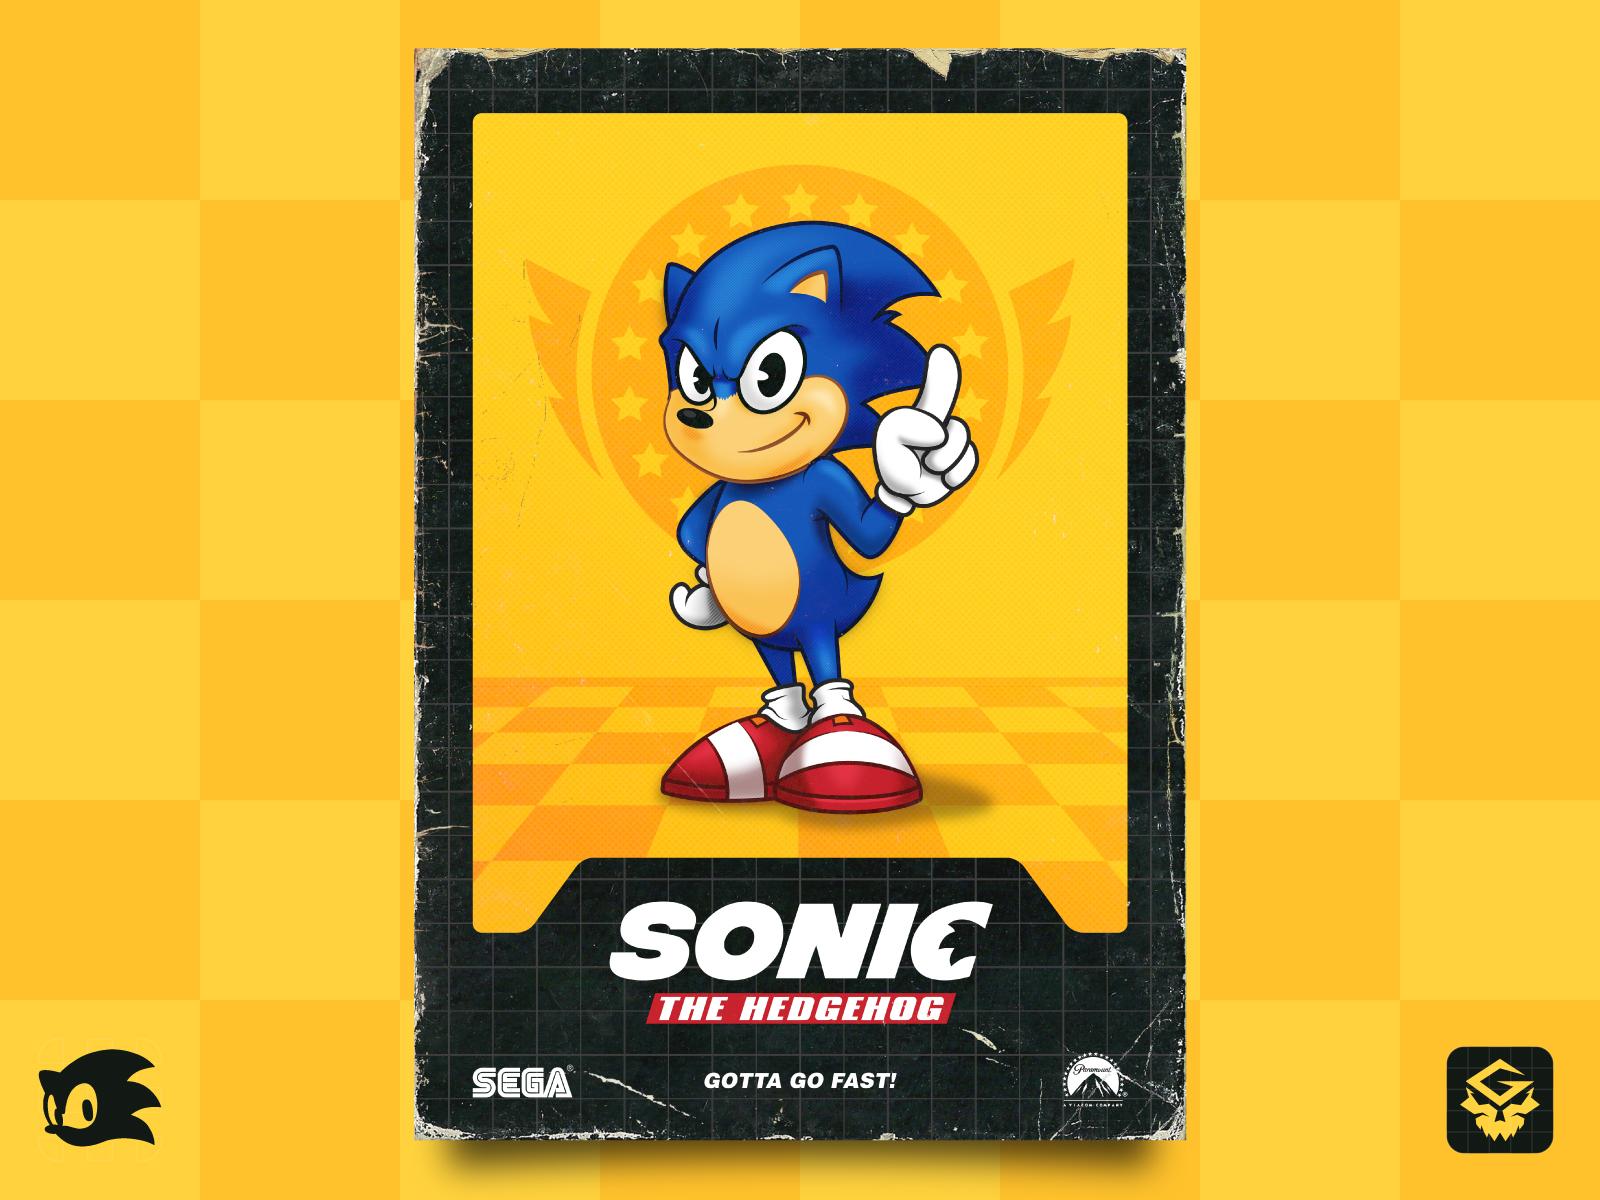 sonic the hedgehog 2 movie logo